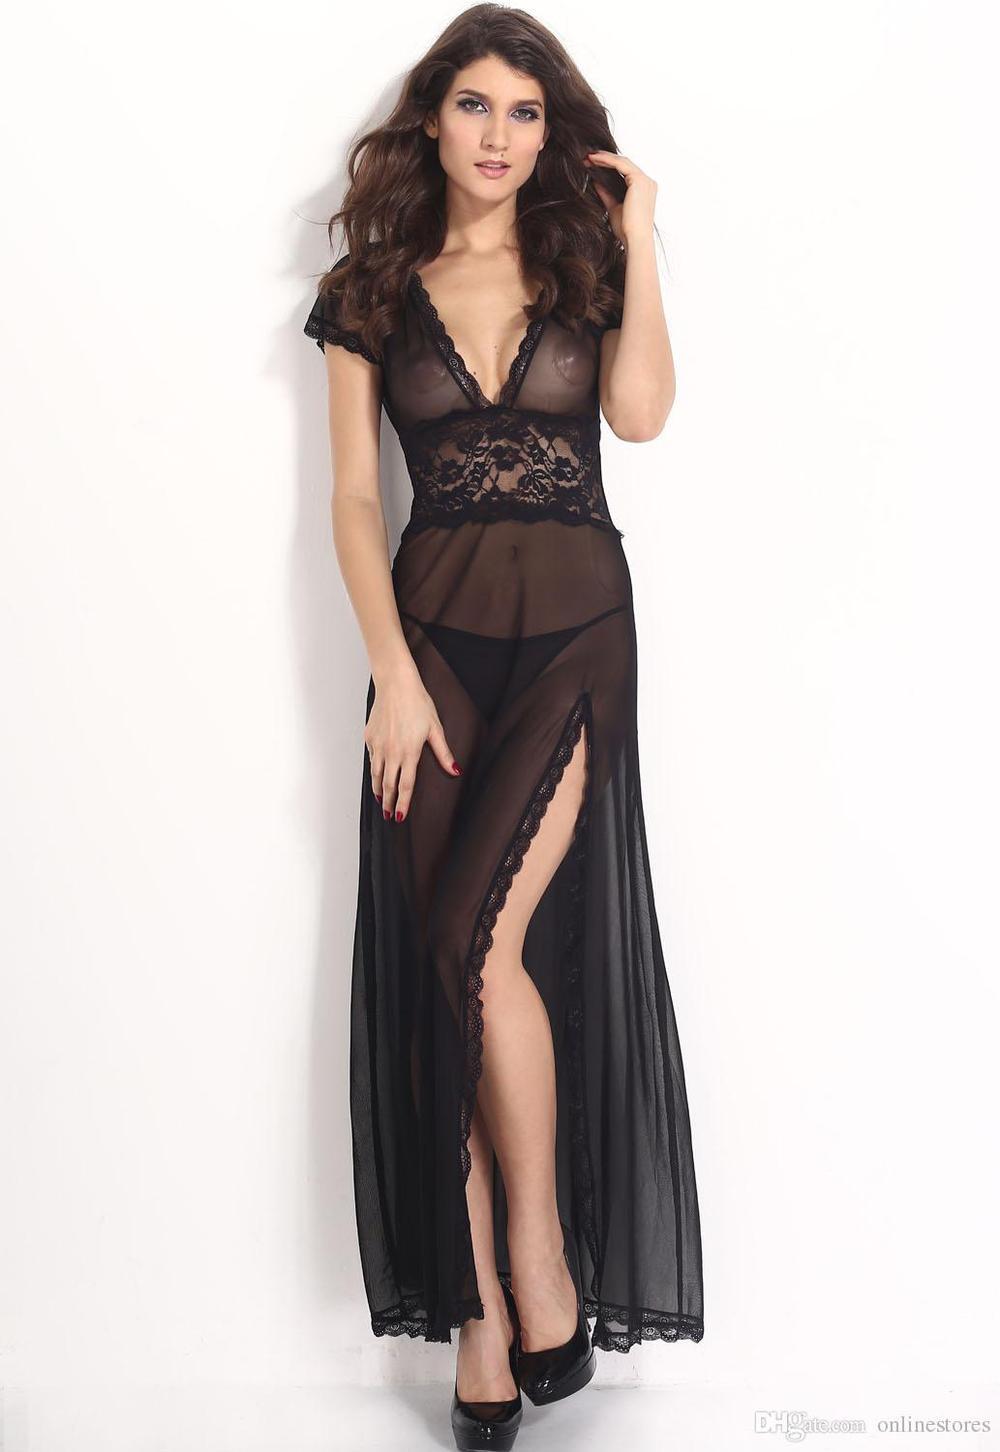 Adogirl 2016 Black/White Red Mesh V Neck Lingerie Sexy Nightwear Women Plus Size 2XL Sleepwear Transparent Lingerie Nighgowns(China (Mainland))